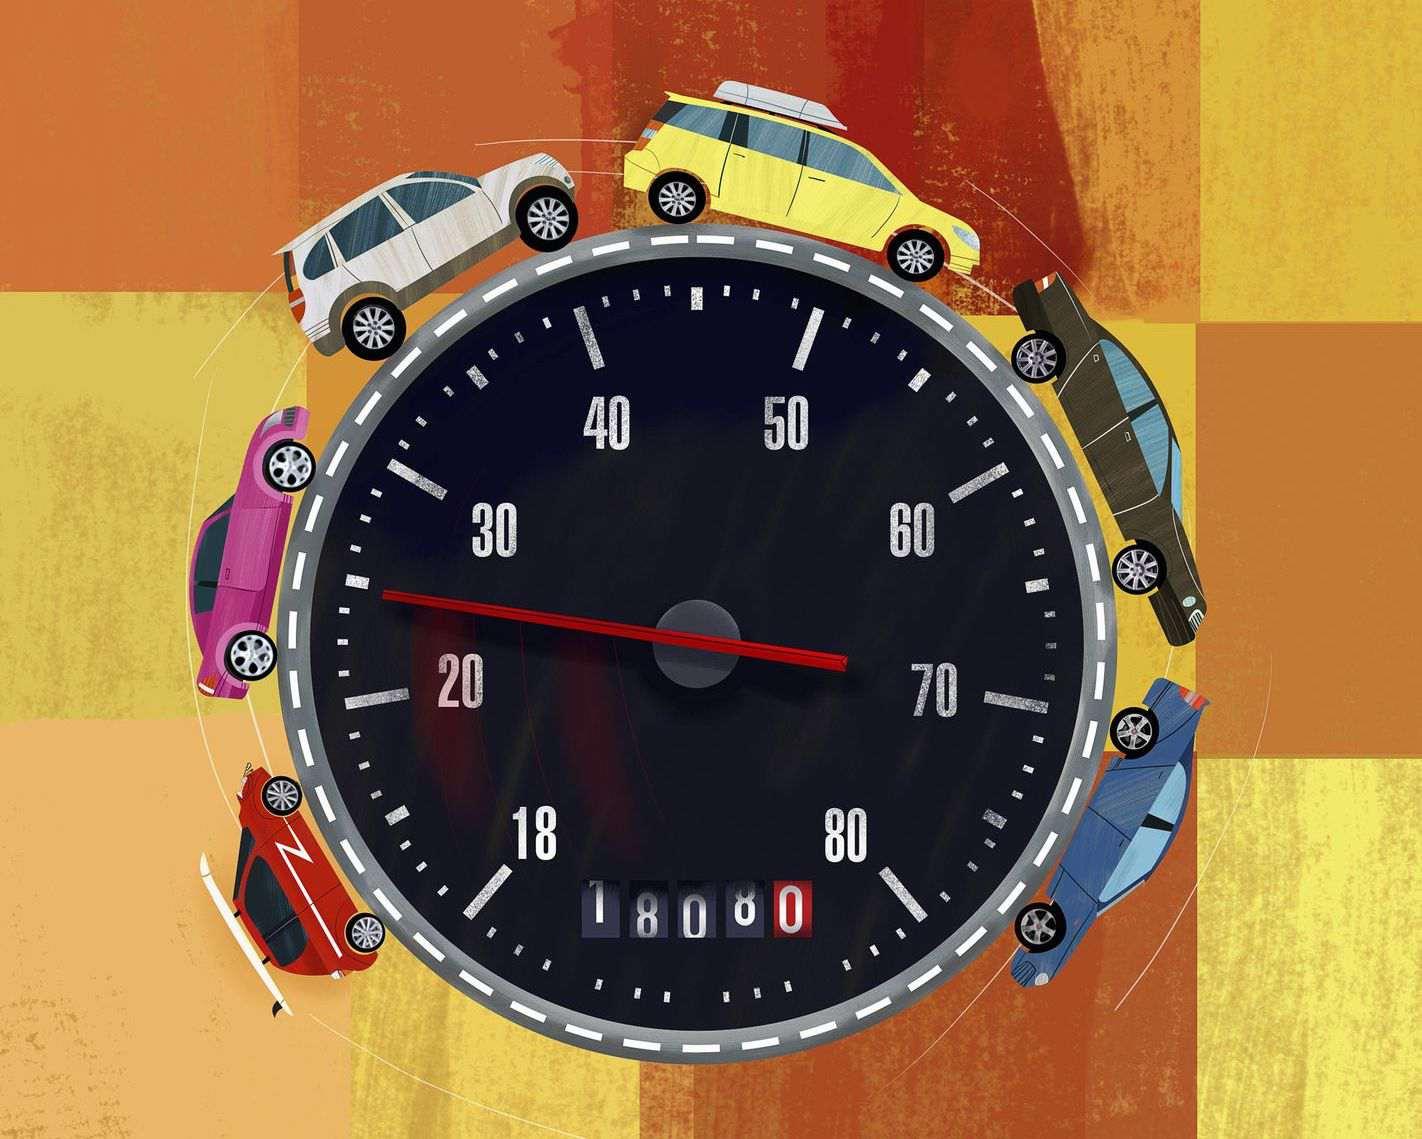 Illustration of cars driving around speedometer